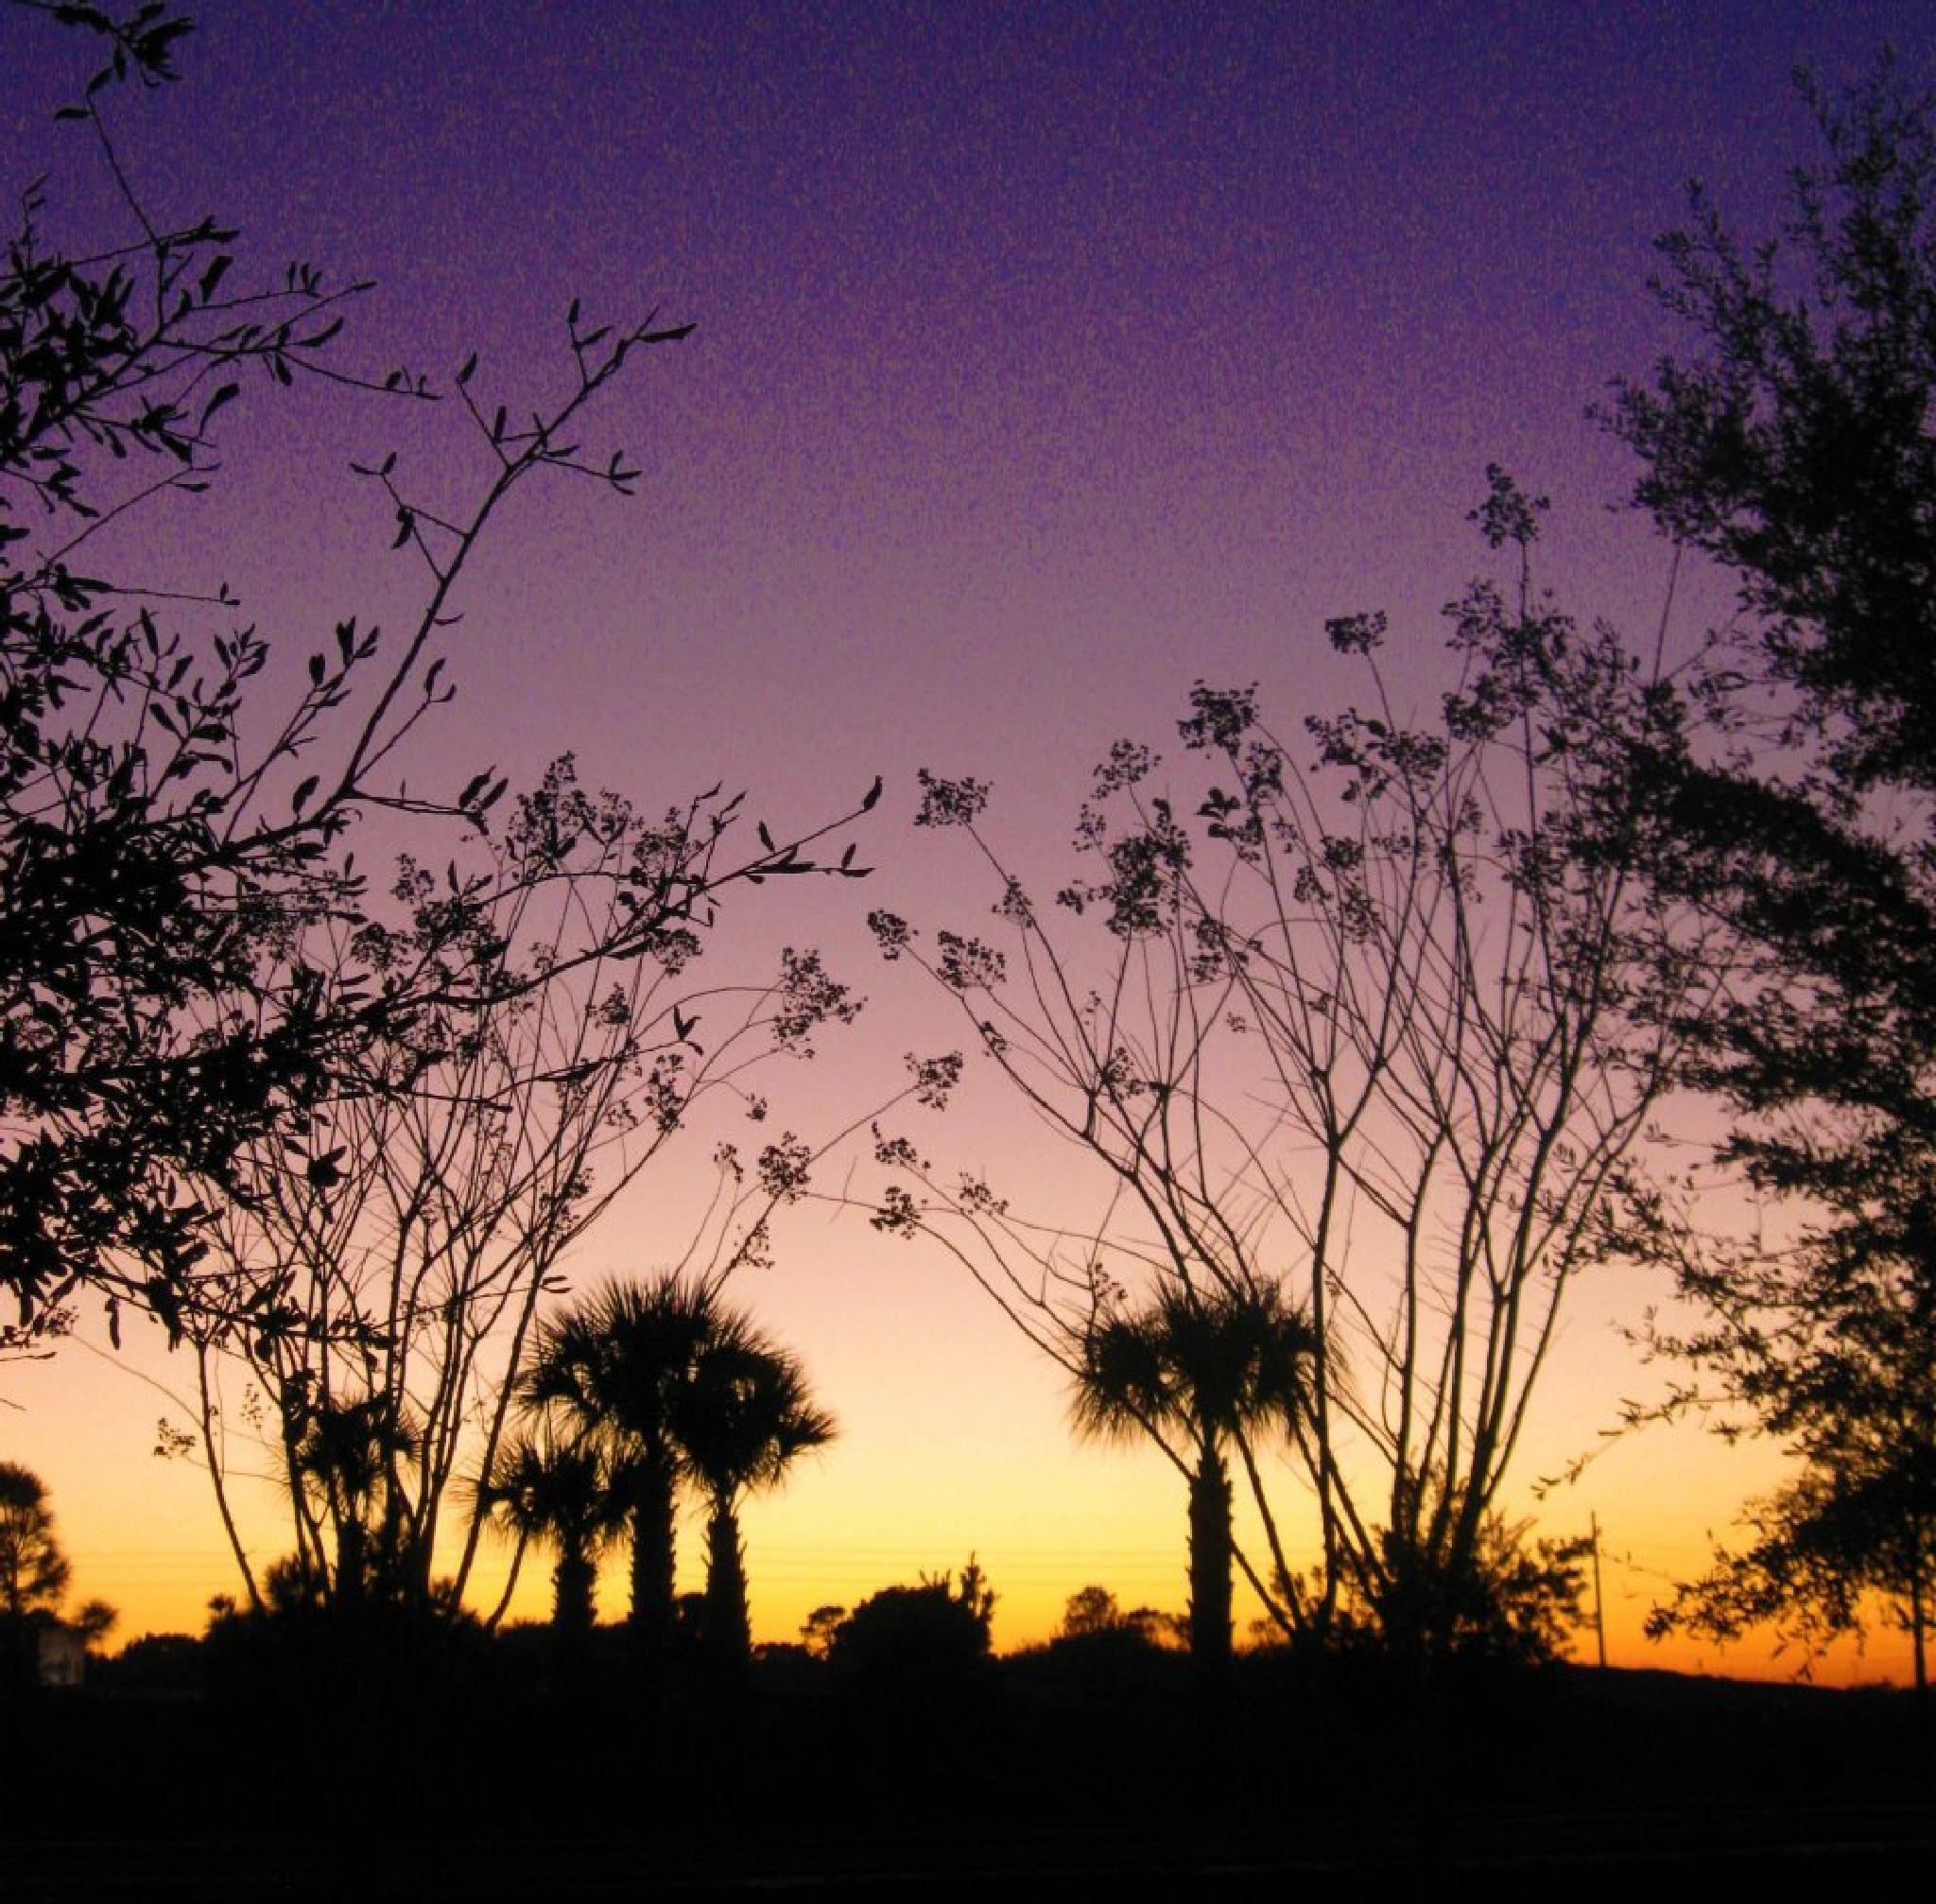 Colorful Sunset by treva.maye